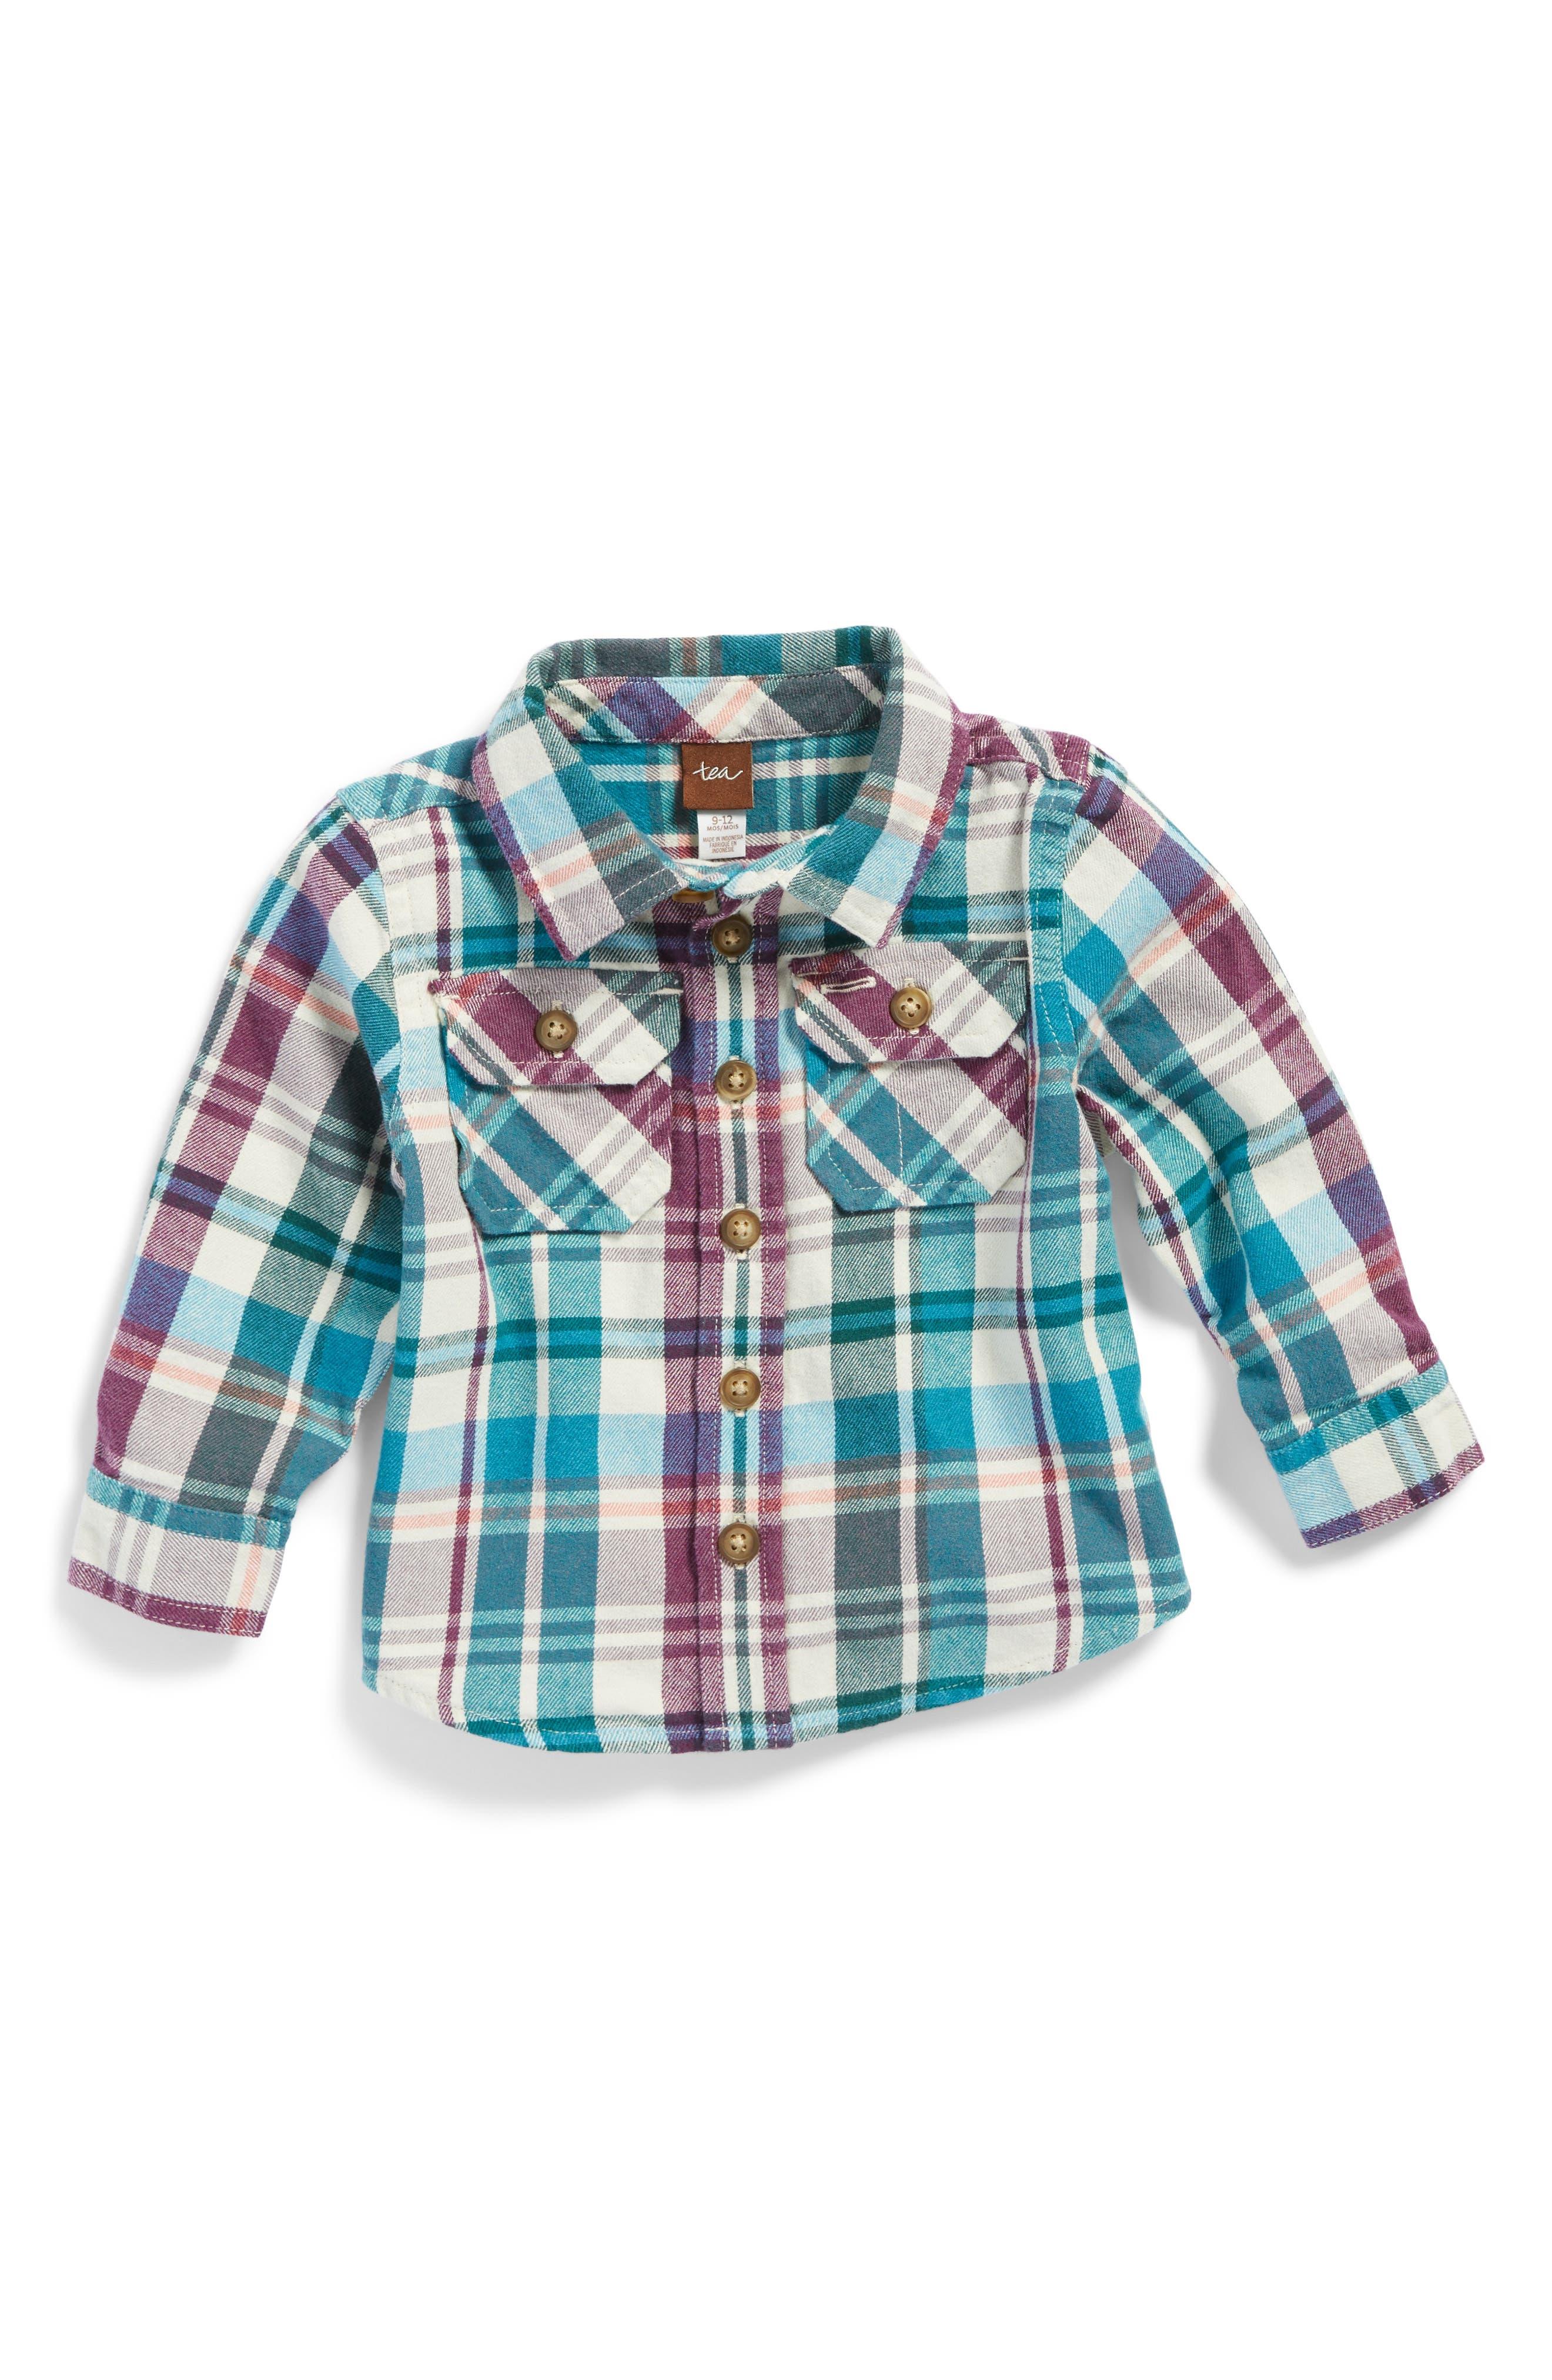 Main Image - Tea Collection Beaufort Plaid Flannel Shirt (Baby Boys)